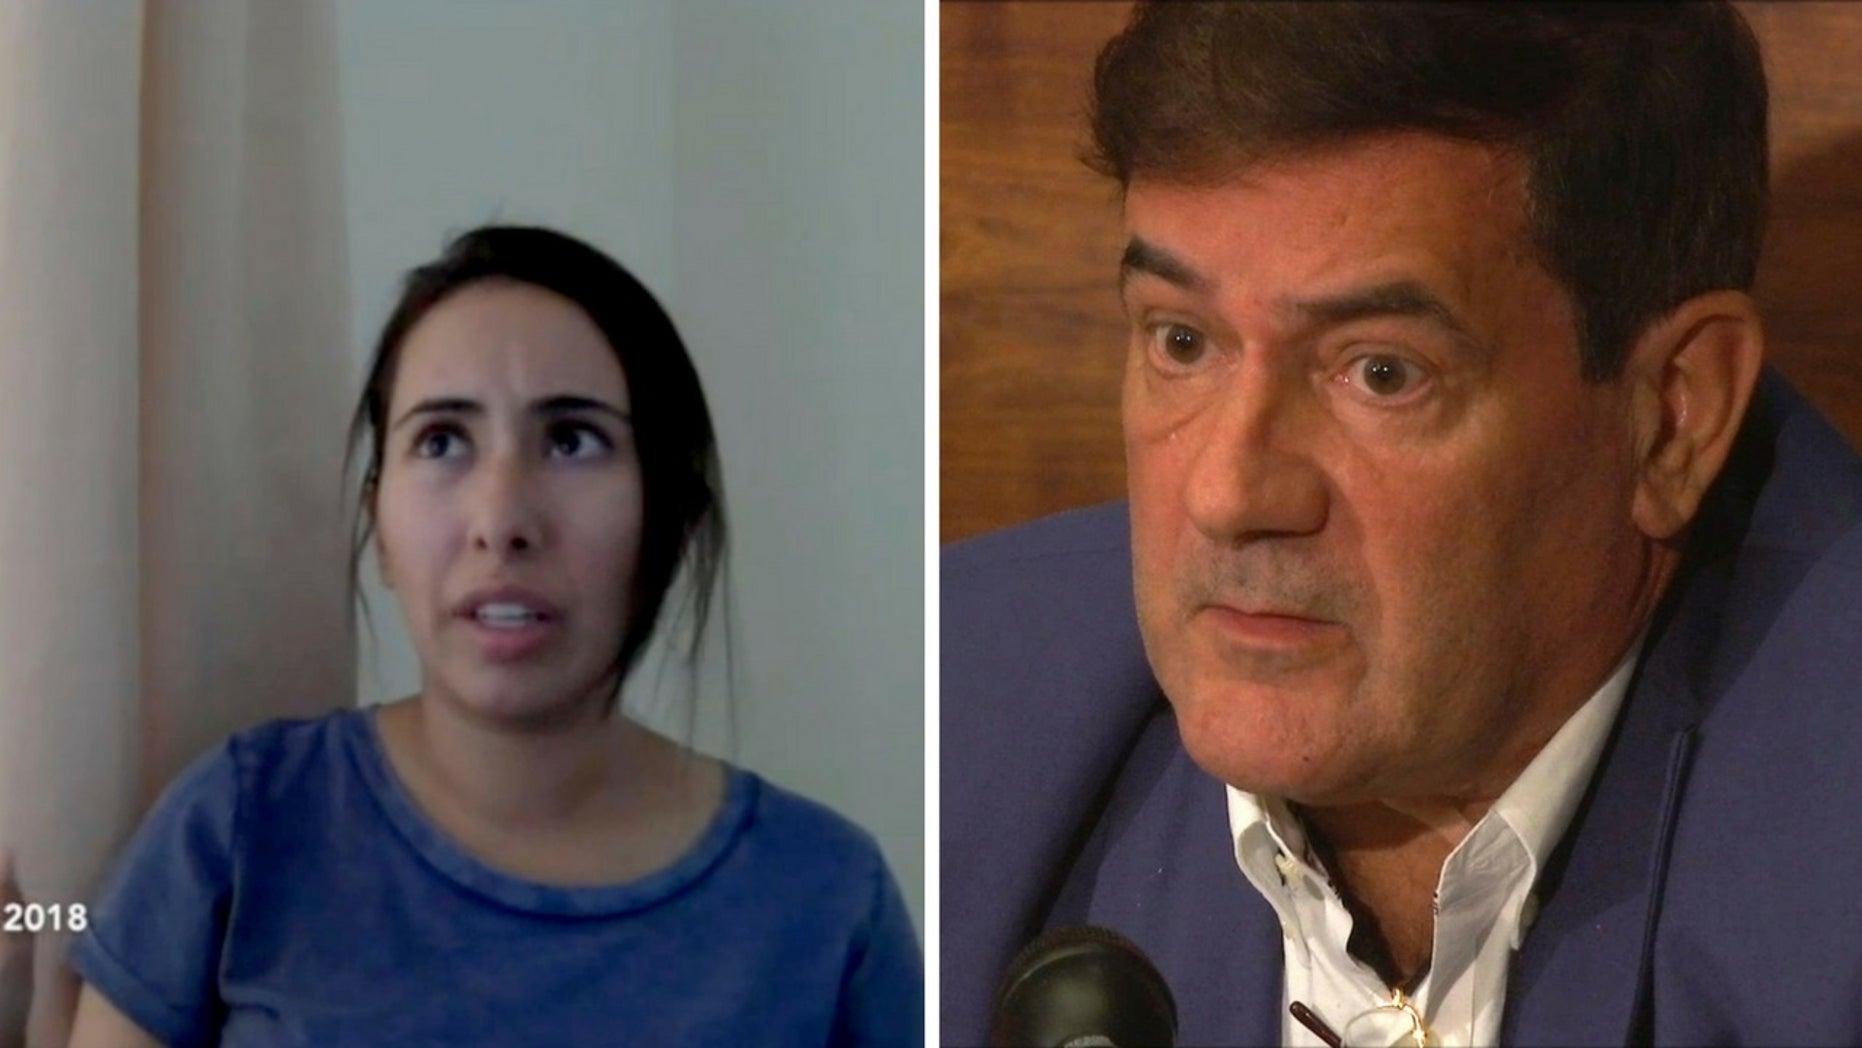 Herve Jaubert, a former French spy, right, said Sheikha Latifa bint Mohammed Al Maktoum, left, has vanished after trying to escape Dubai.